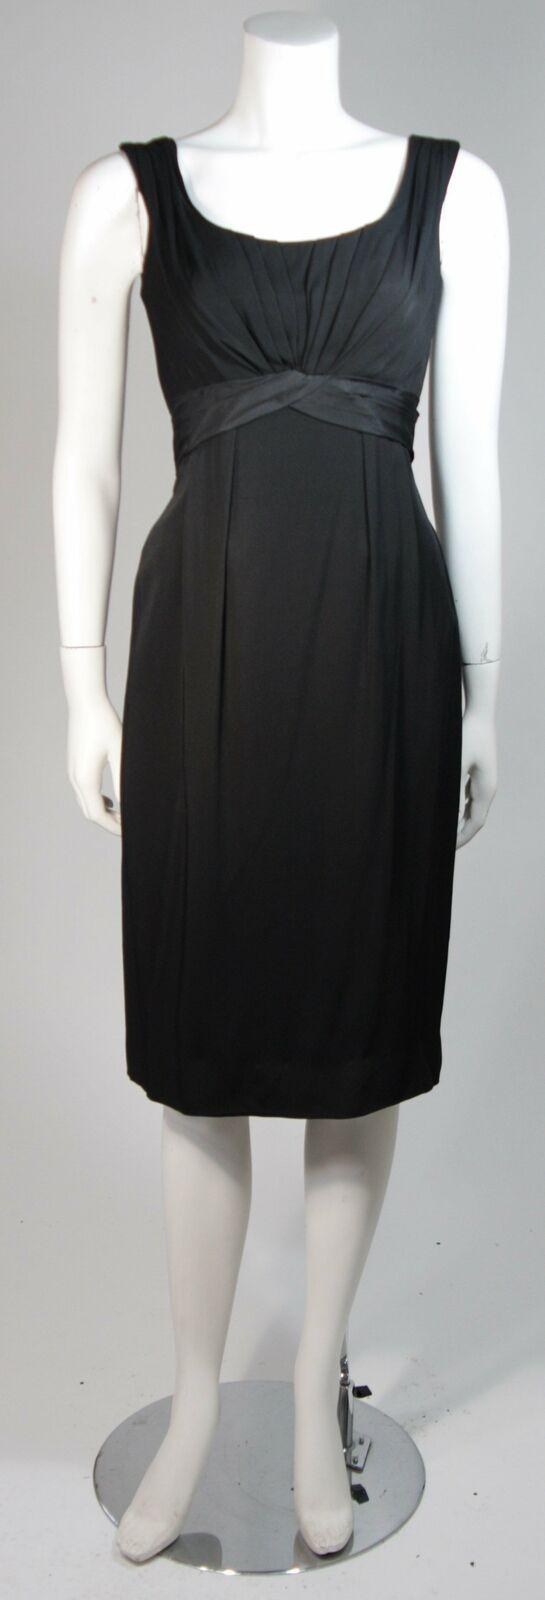 CEIL CHAPMAN 1950s Black Draped Cocktail Dress Si… - image 2